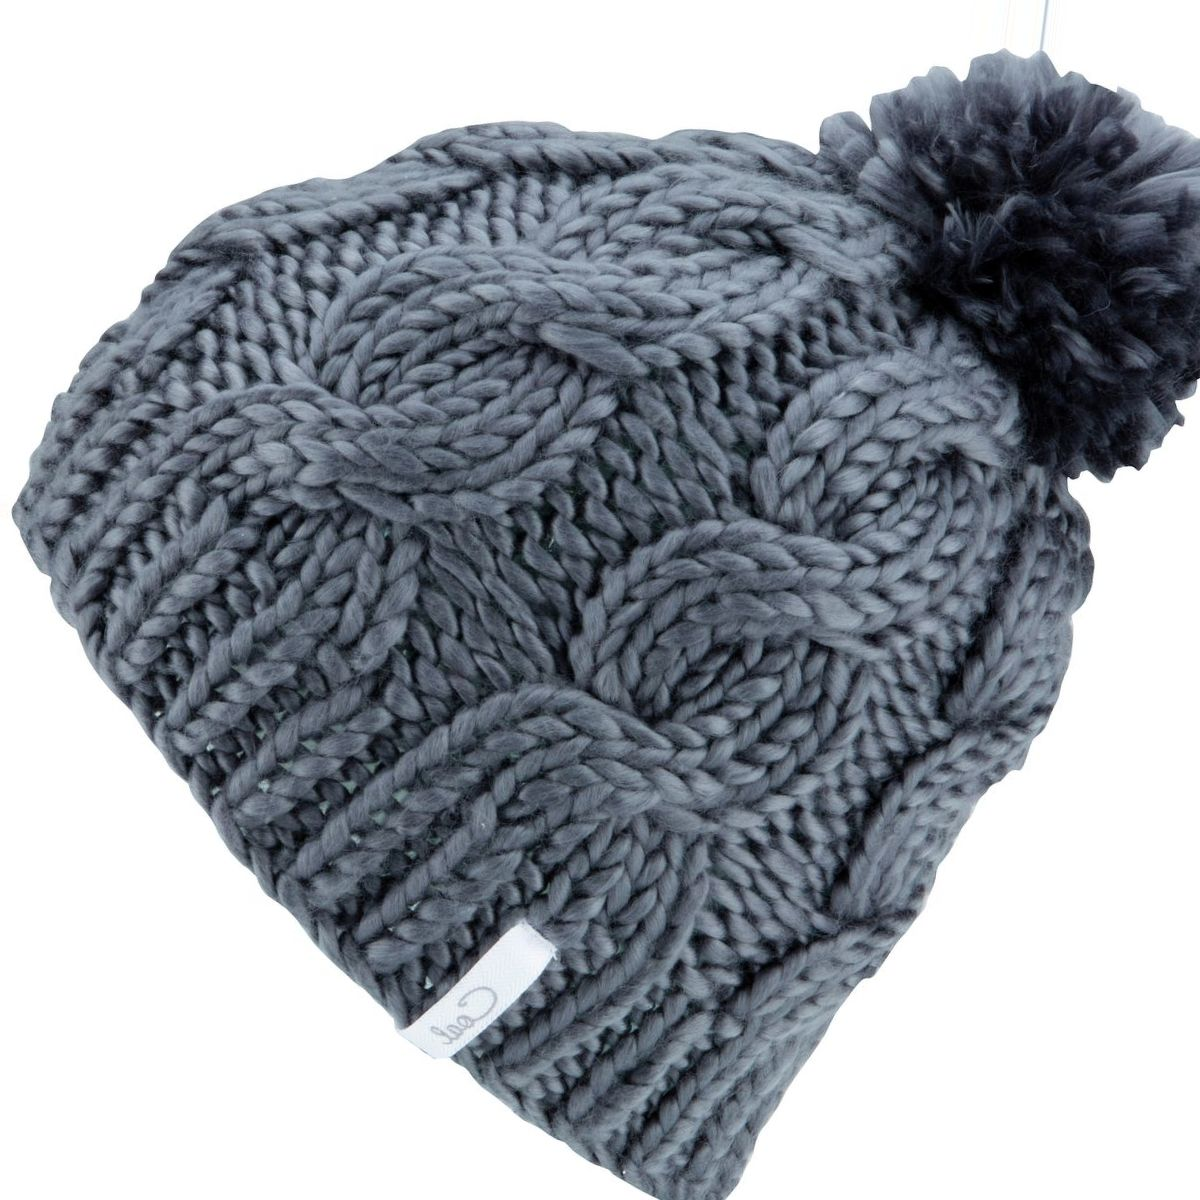 Coal Headwear Rosa Beanie - Women's